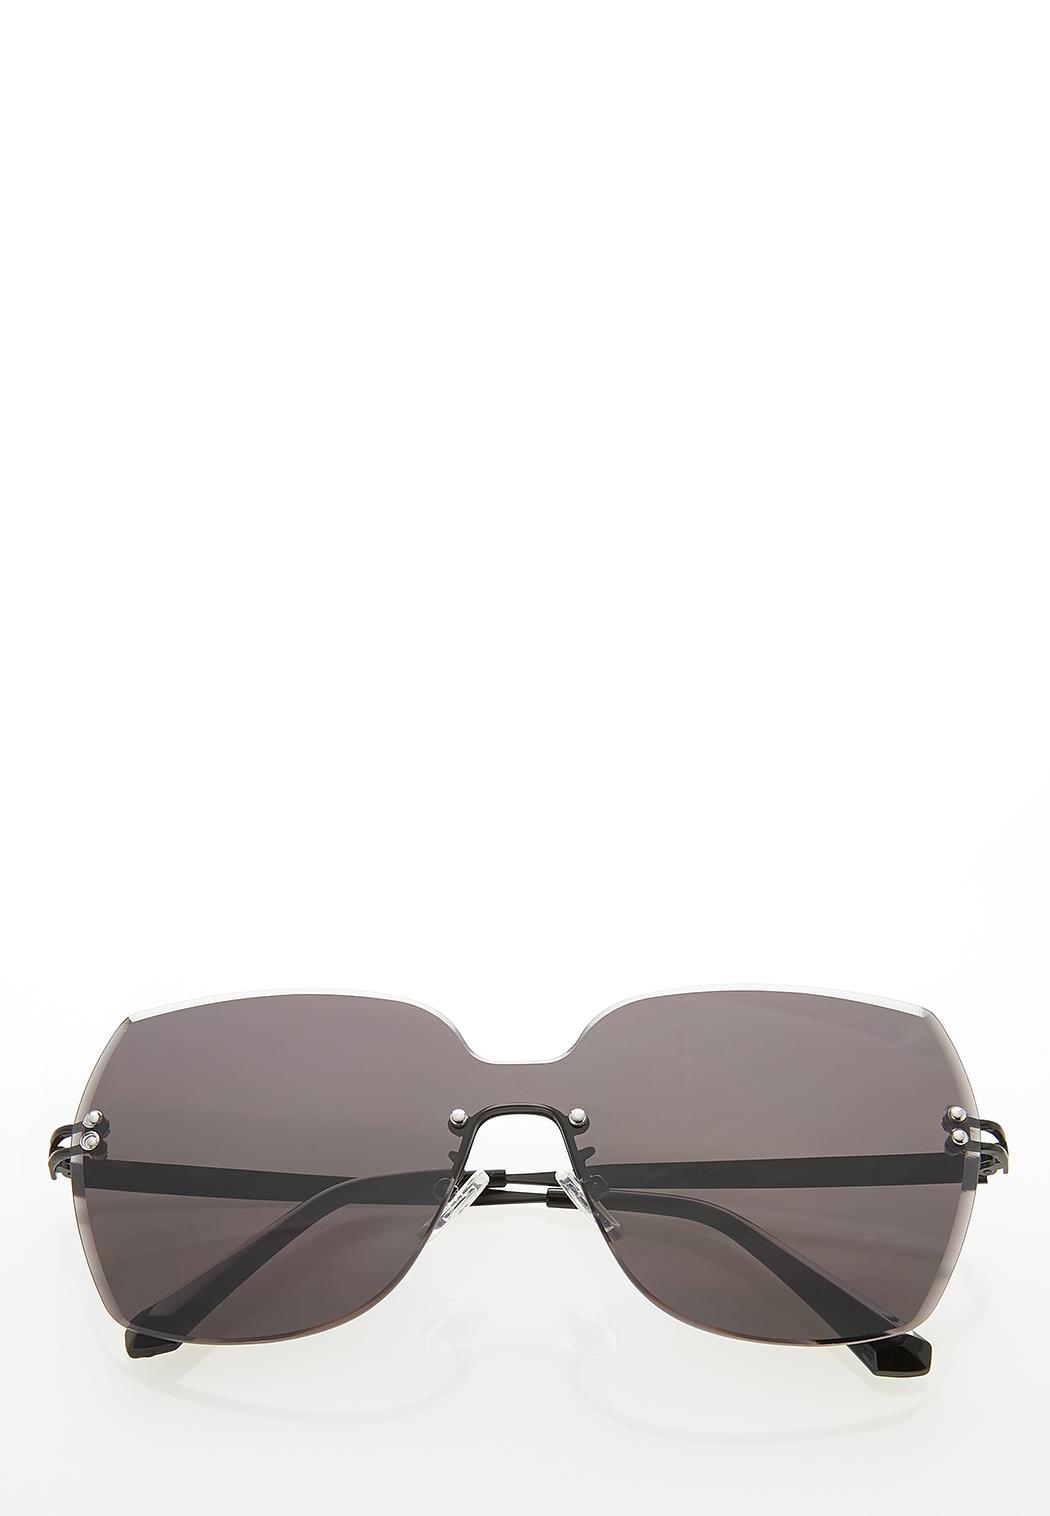 Beveled Rimless Sunglasses